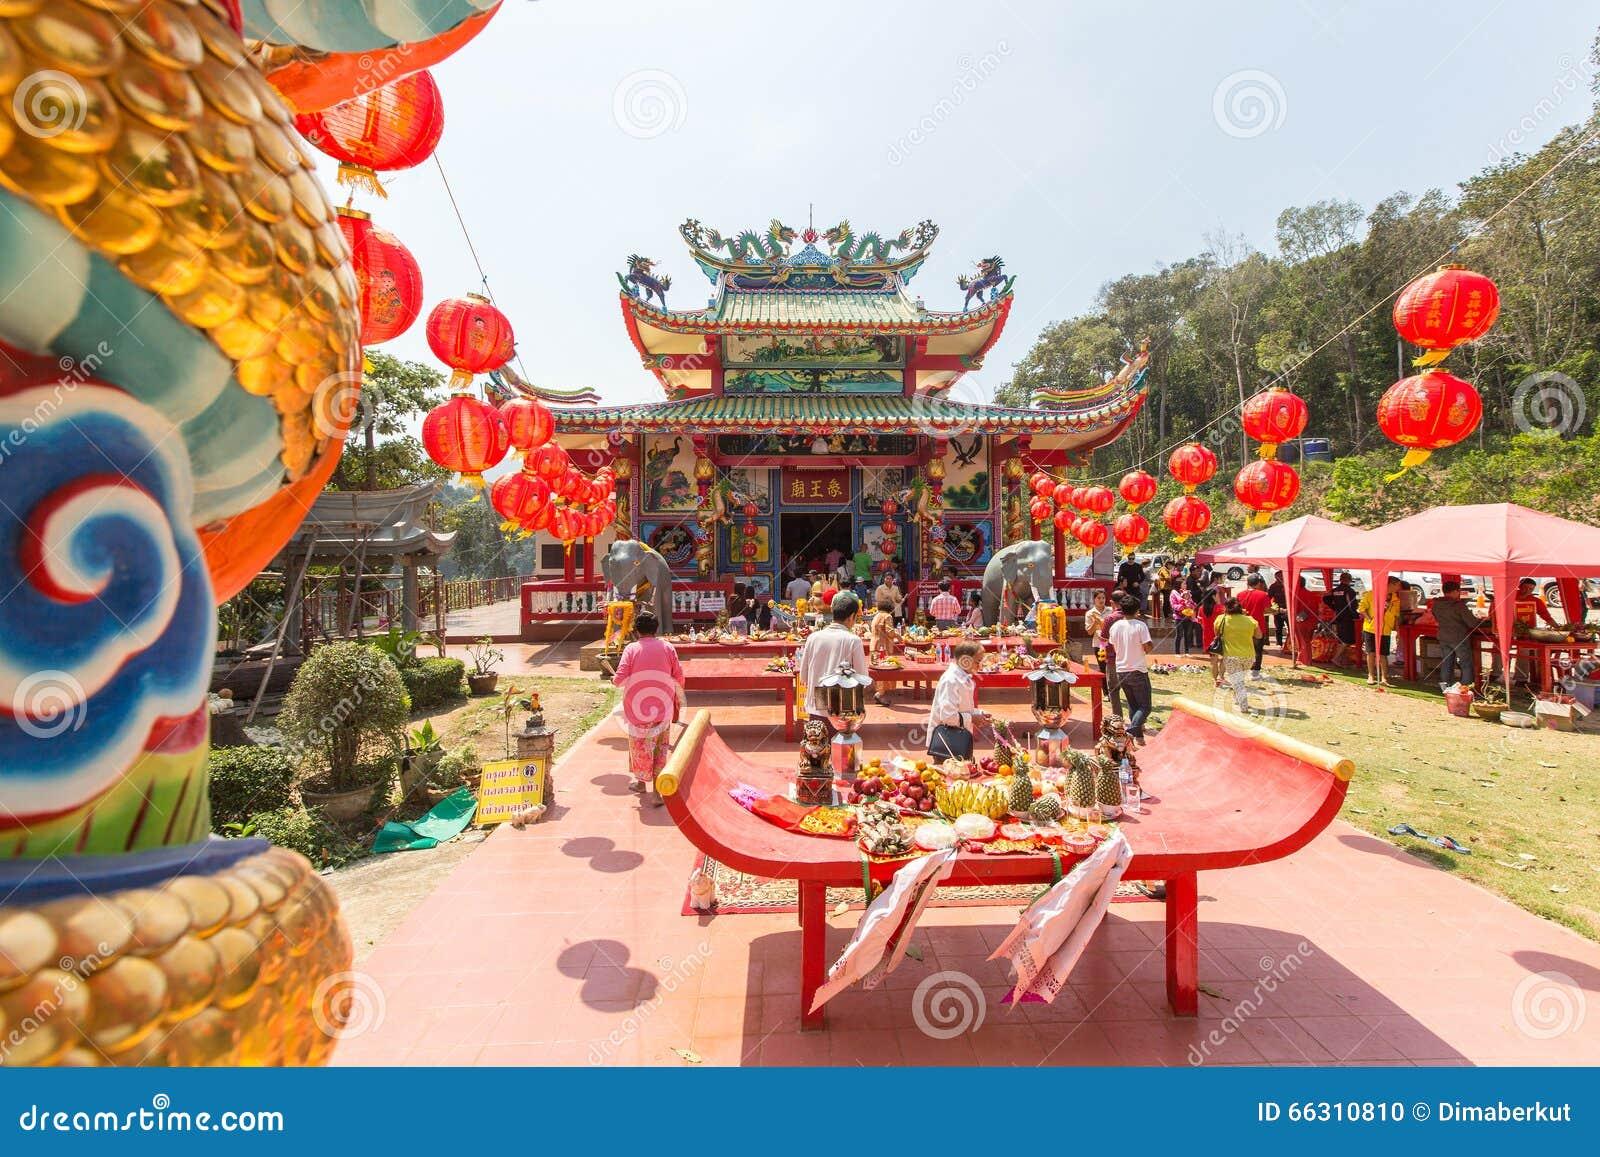 Chinese co chang ni unsencored 7